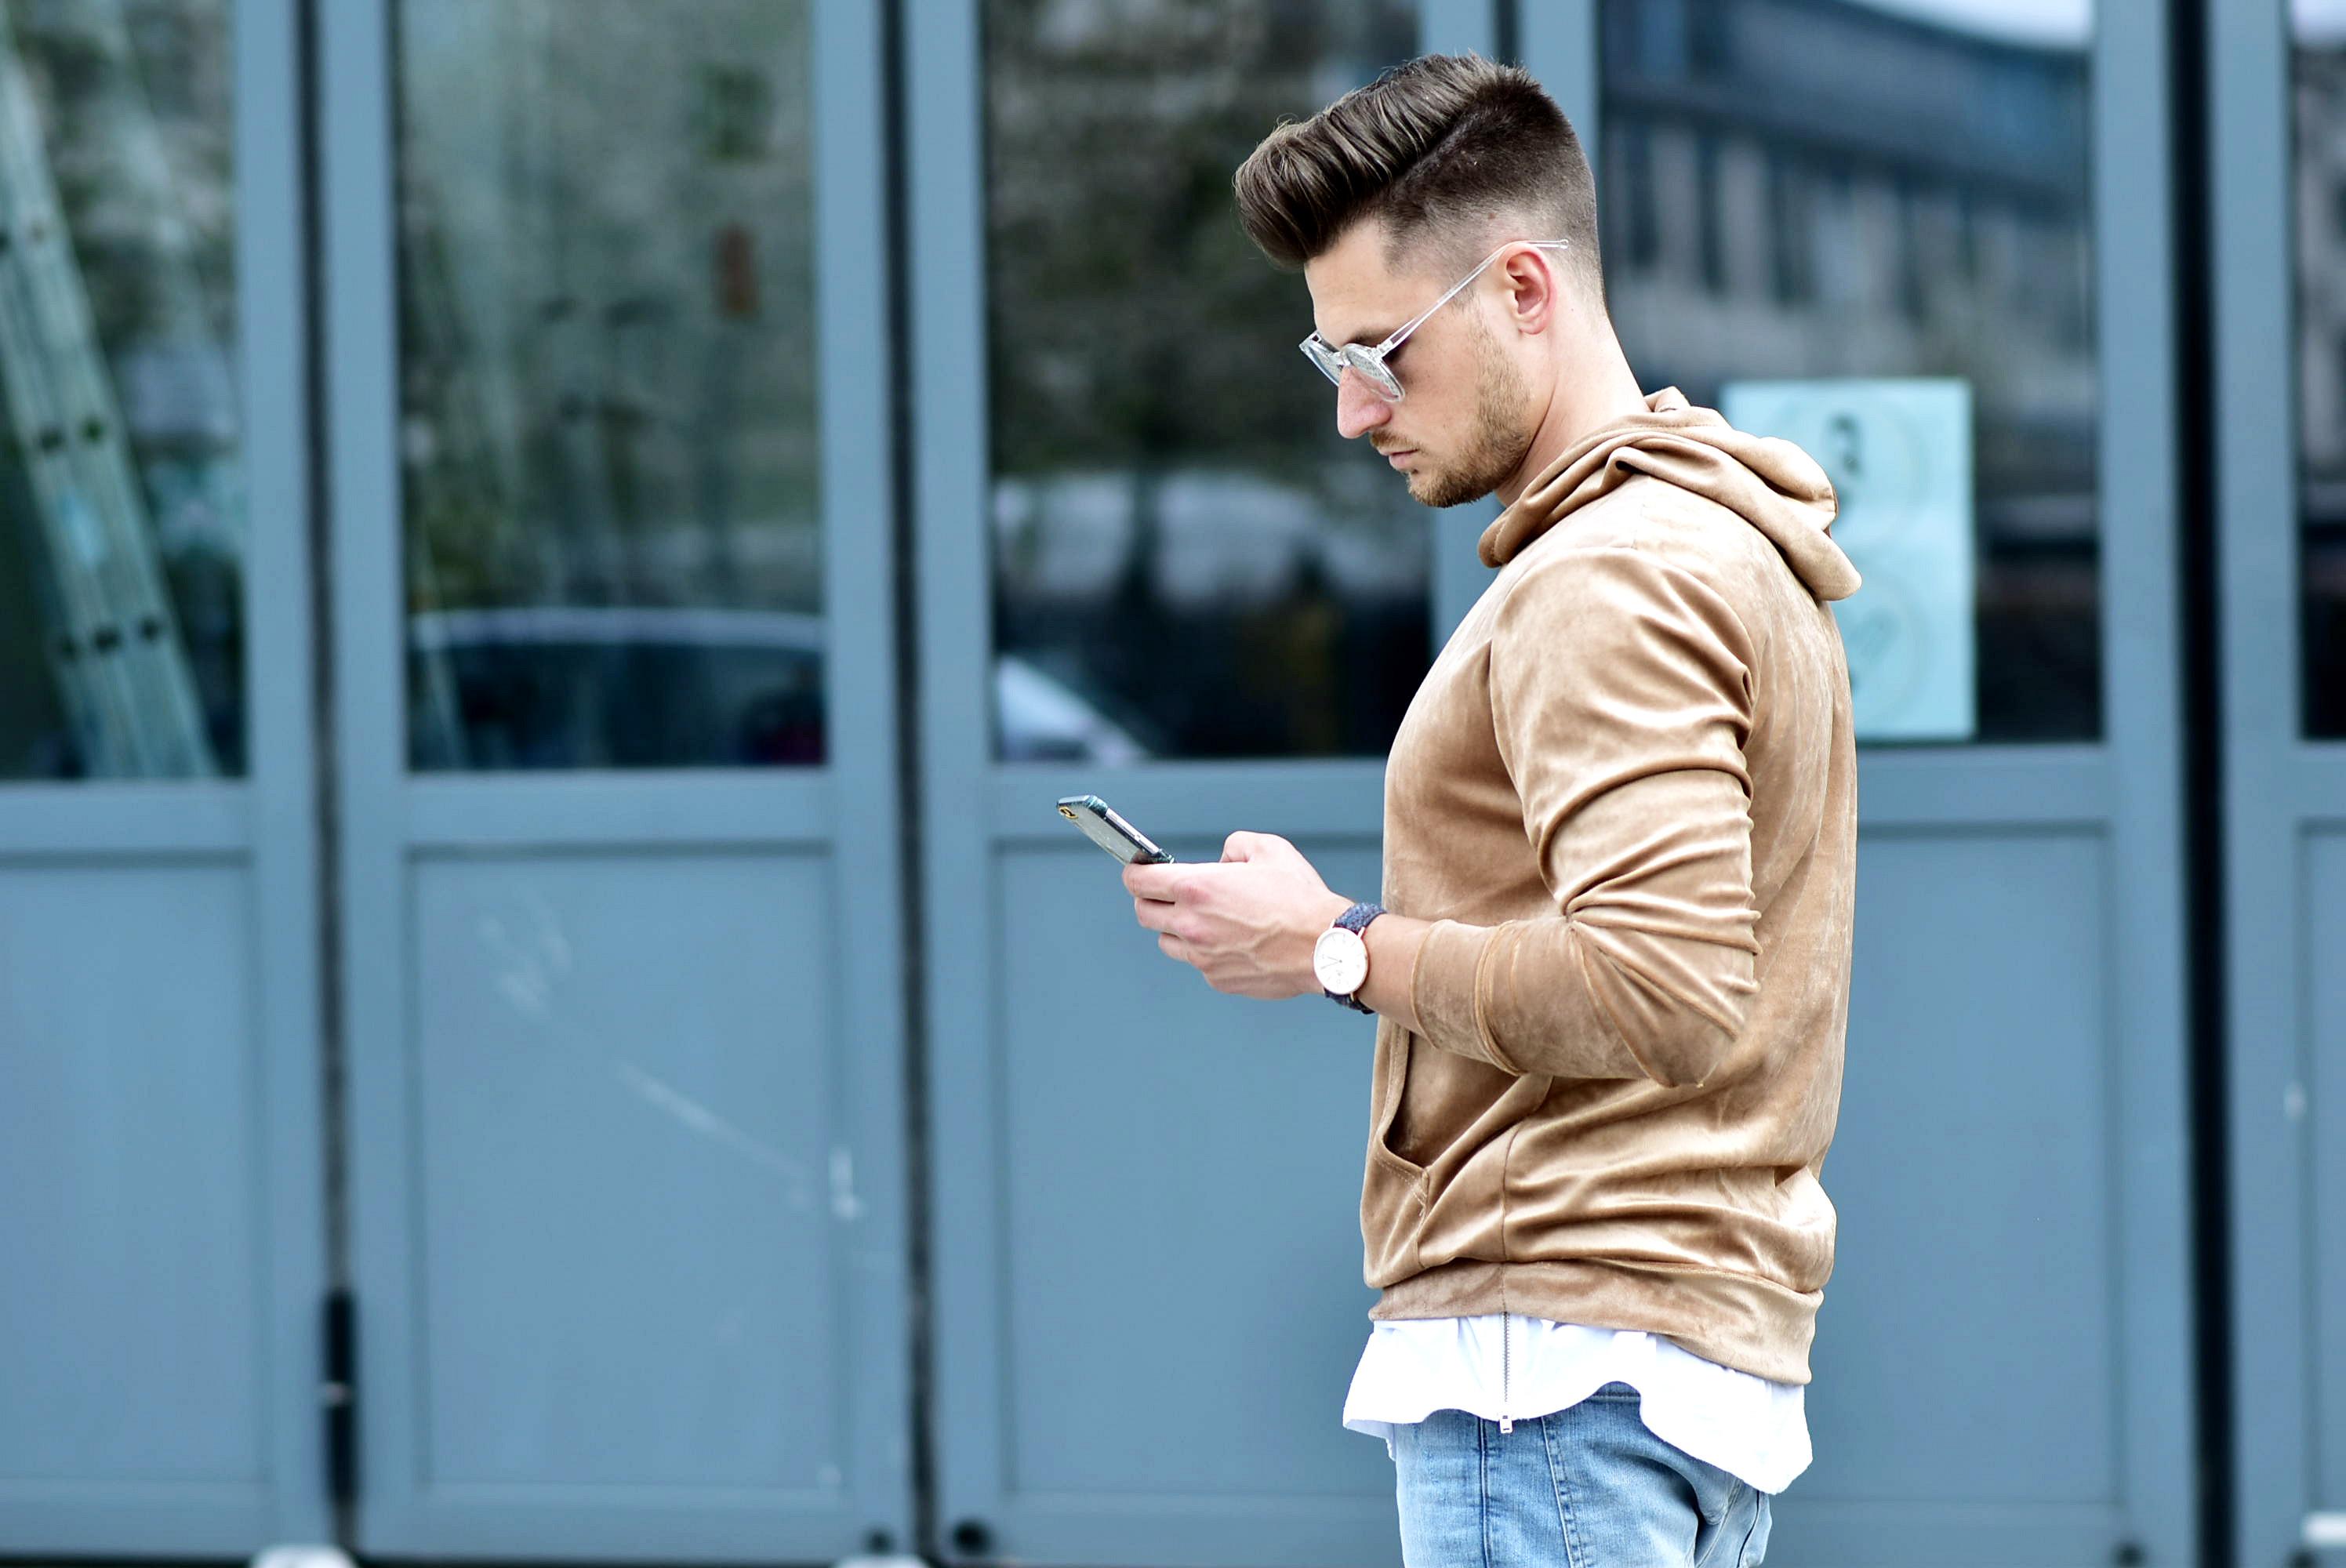 Tommeezjerry-Styleblog-Männerblog-Männer-Modeblog-Berlin-Berlinblog-Outfit-Streetlook-Vintage-Retro-Oversized-Adidas-Superstar-Skinny-Jeans-Velours-Nude